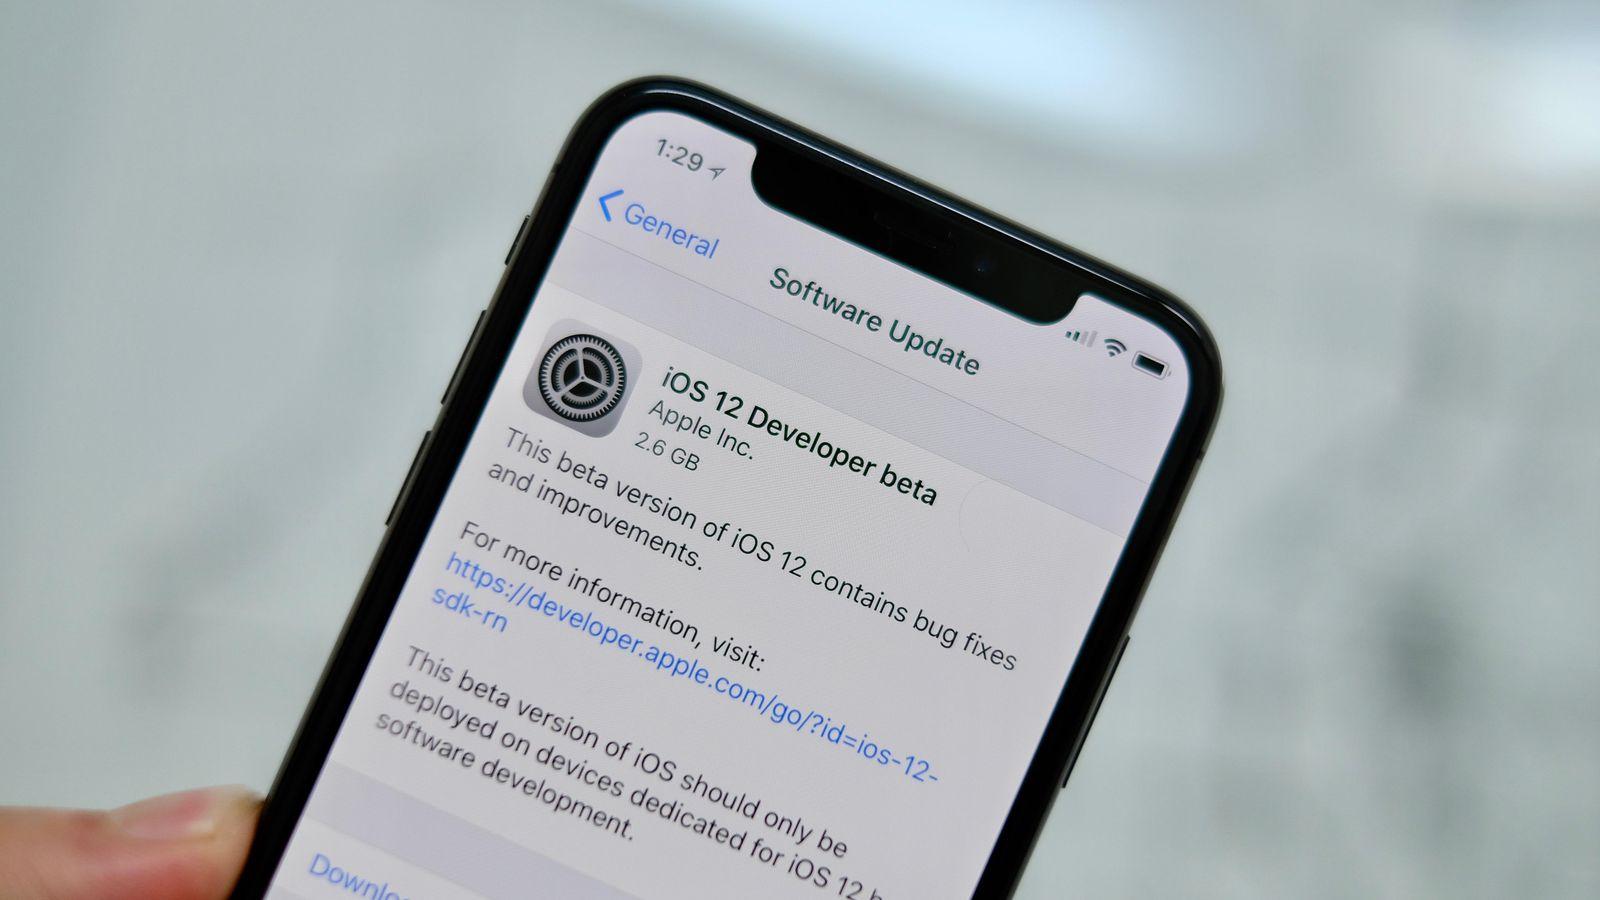 Download iOS 12 Developer Beta 2 without developer account | MyMobileTips